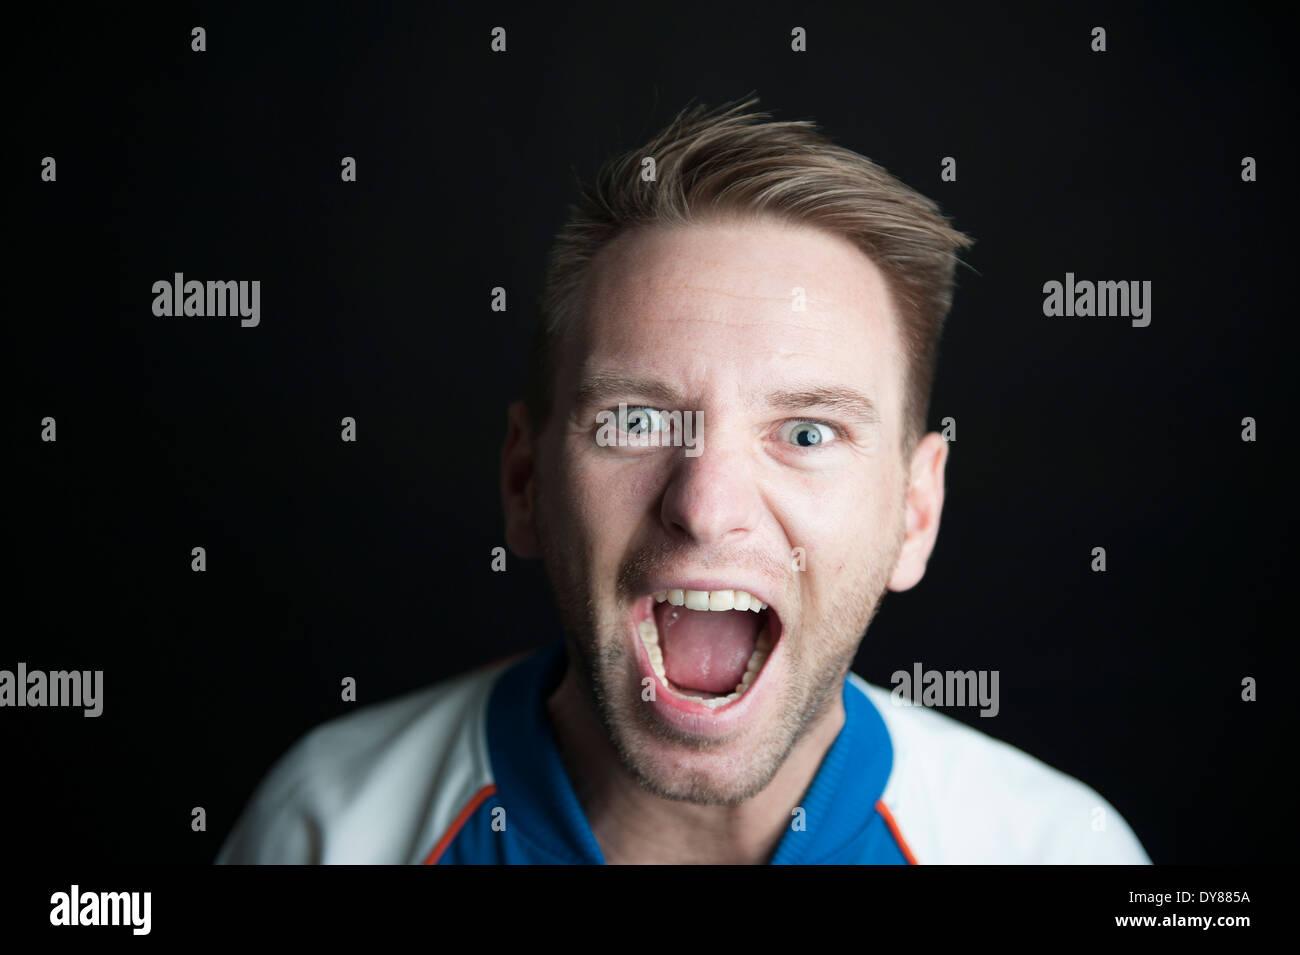 Shouting man, portrait - Stock Image